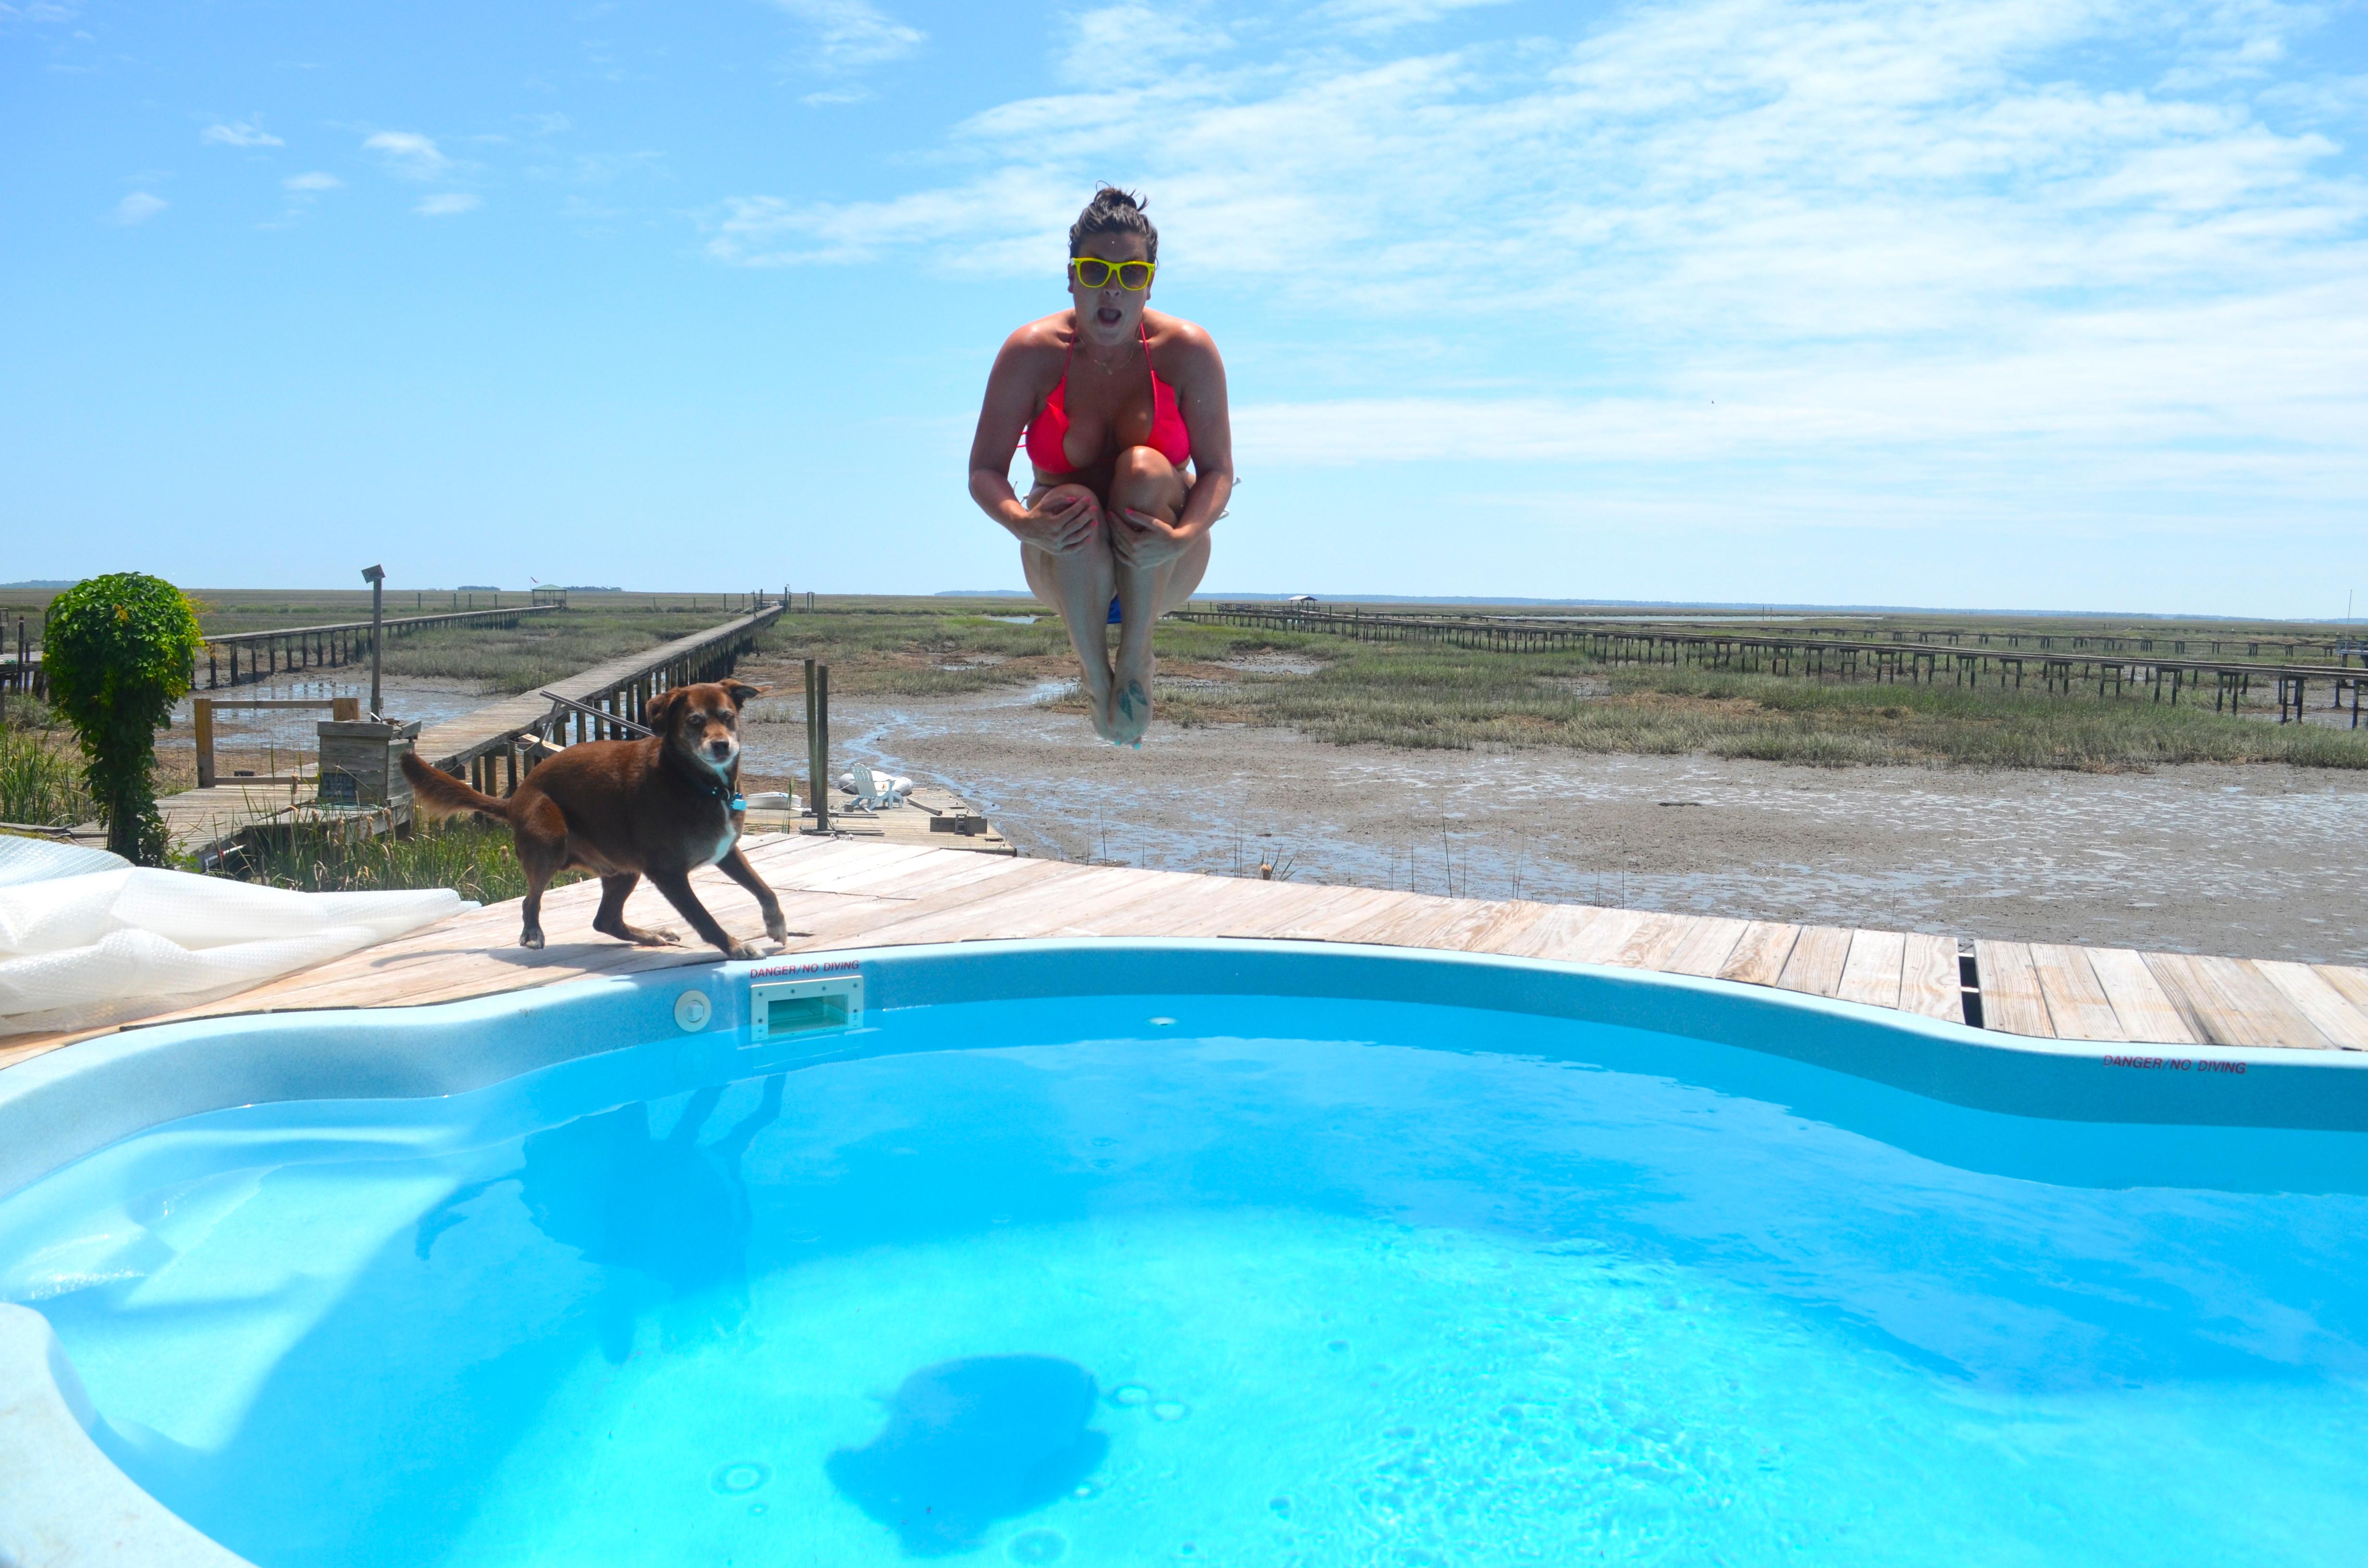 Pool Splash Cannonball With Now Cannonball Blackbird Ideas